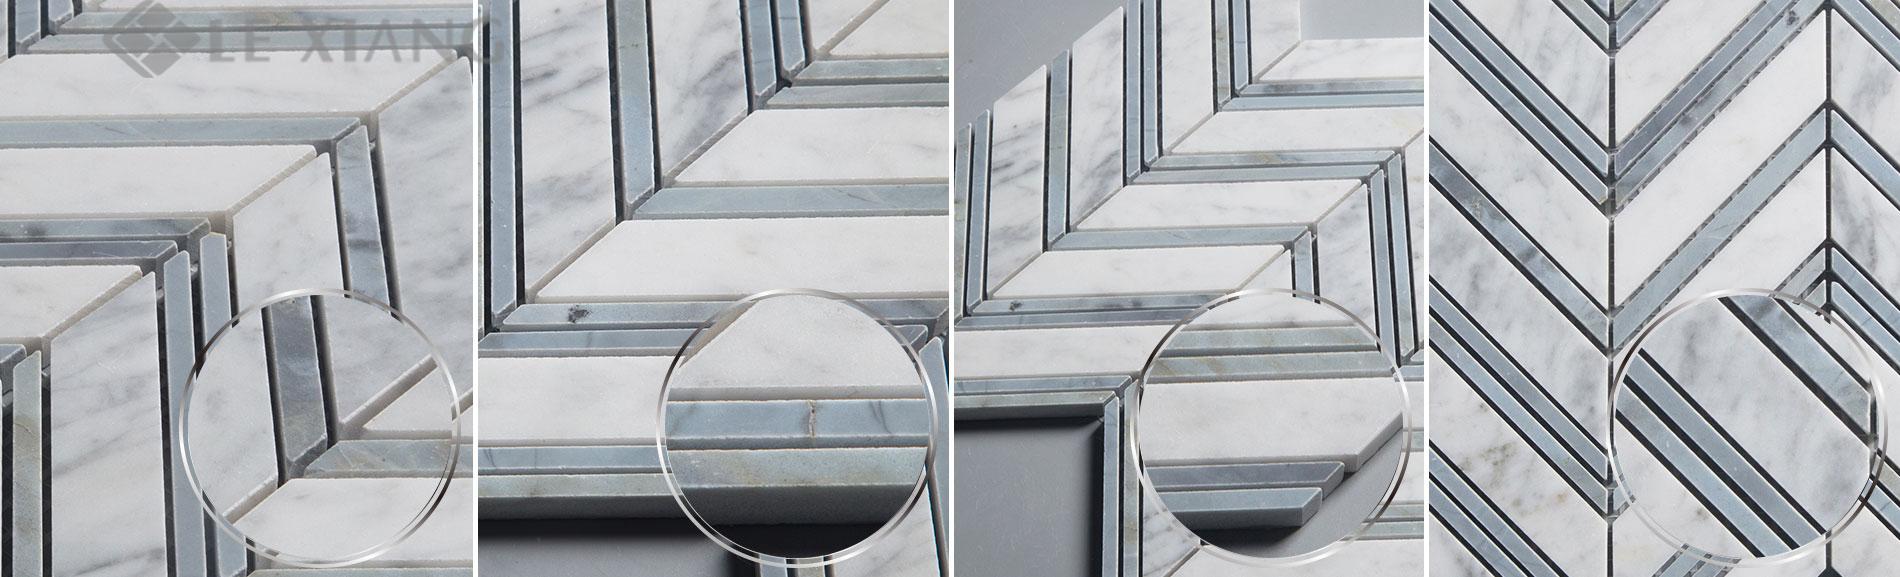 Chevron-Pattern-Marble-Mosaic-Tile-Bothroom-Floors-Kitchen-Backsplash-1-7